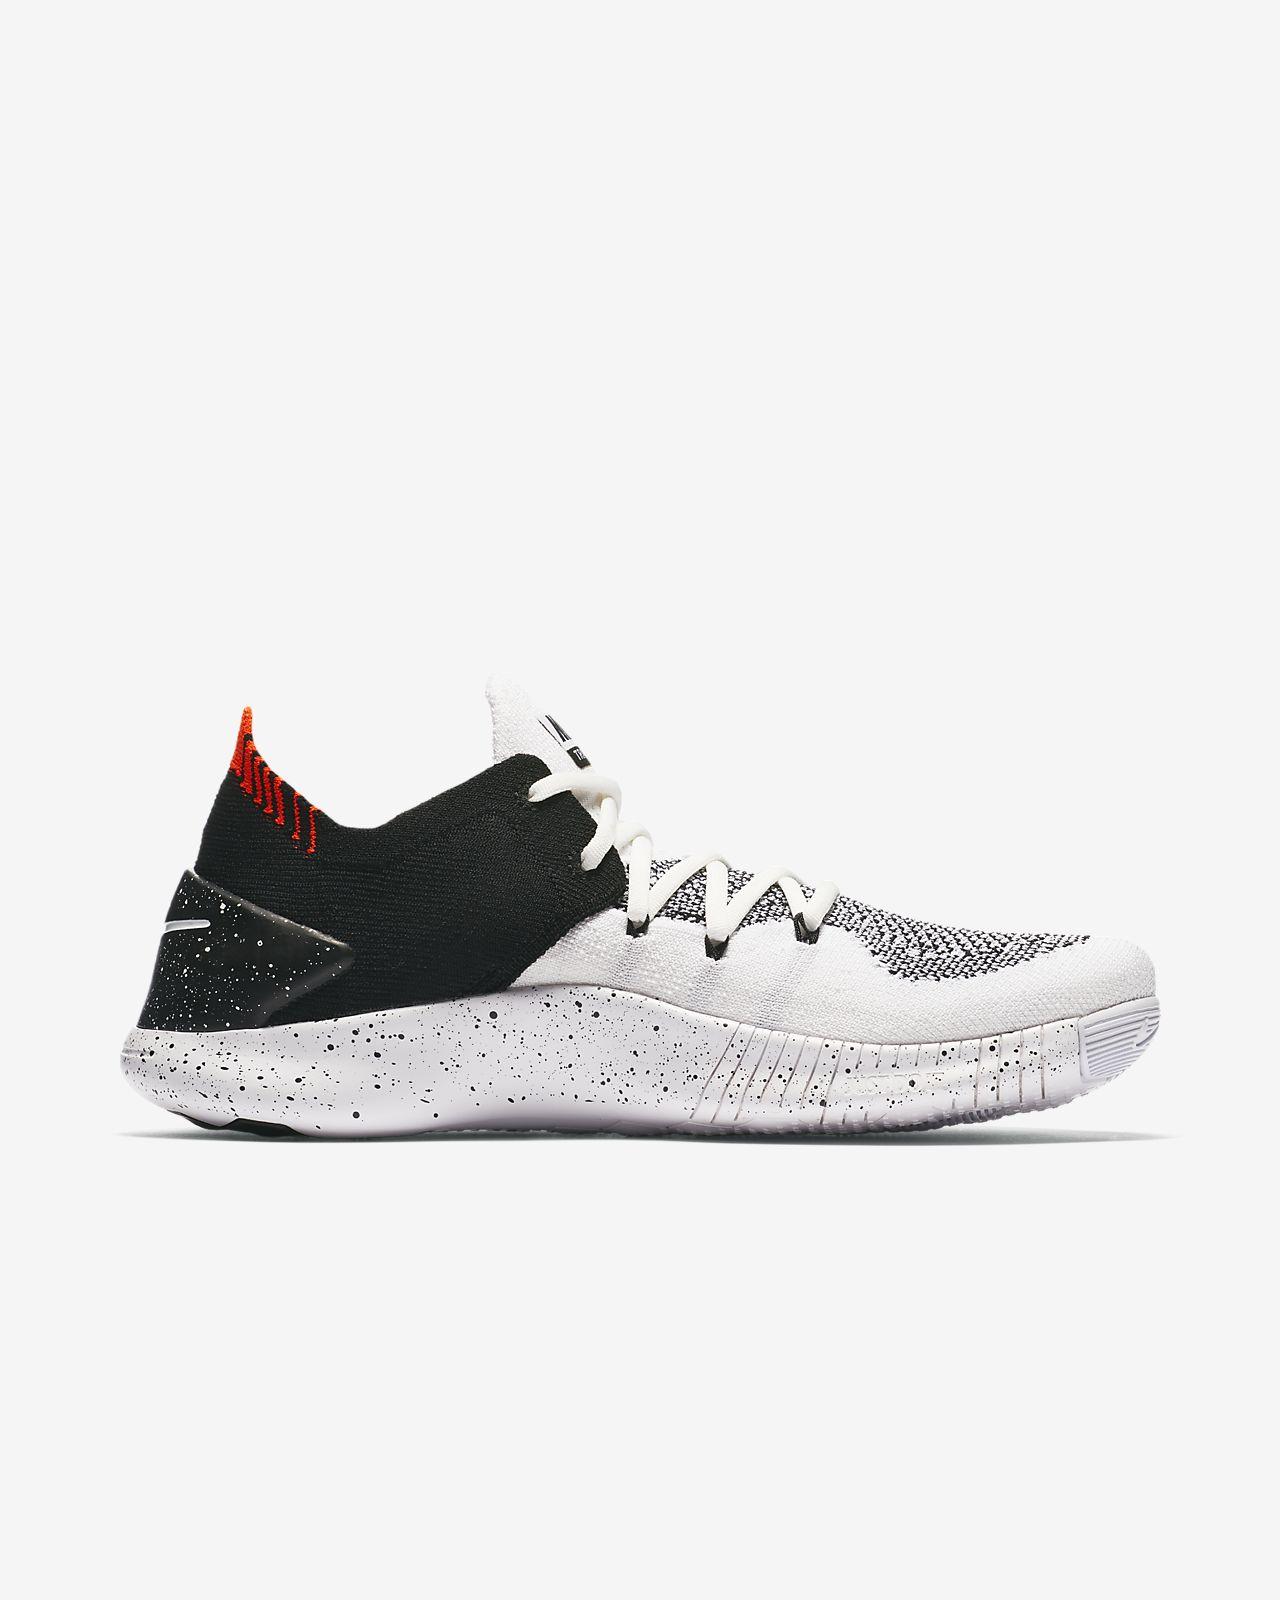 ... Chaussure de training Nike Free TR Flyknit 3 pour Femme